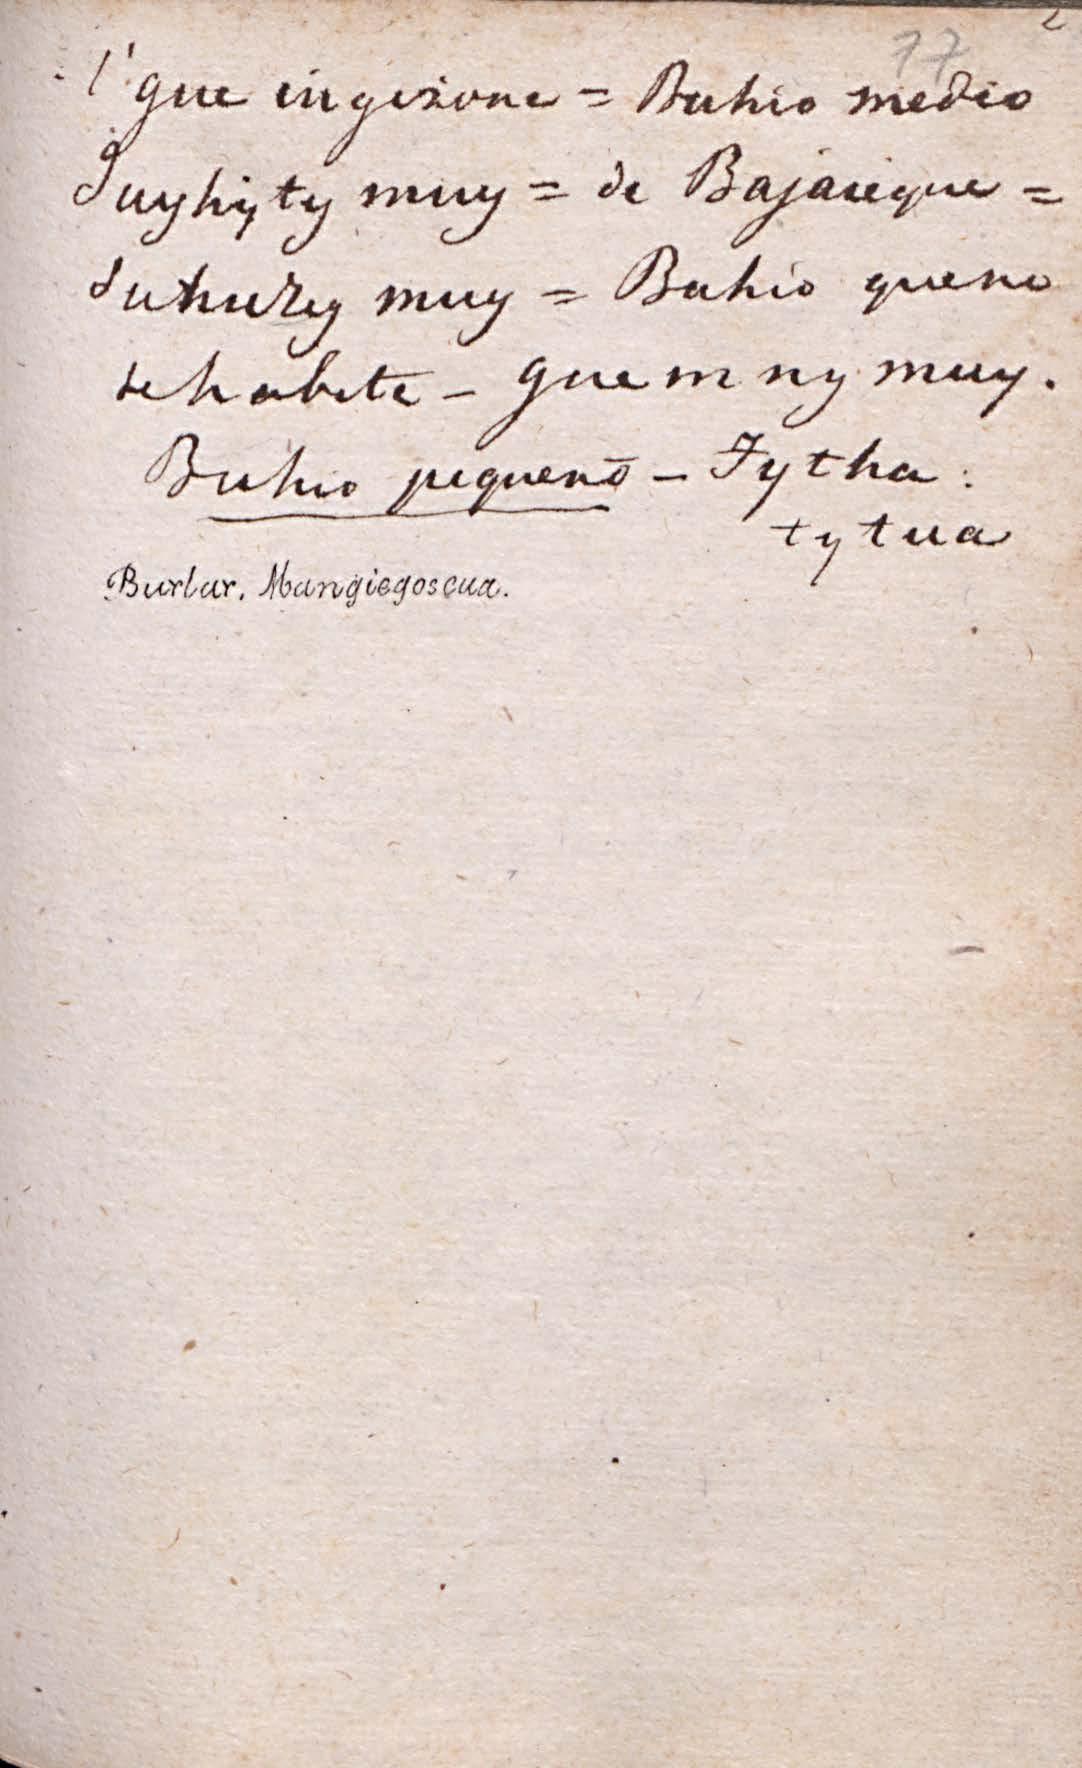 Manuscrito 158 BNC Vocabulario - fol 27r.jpg